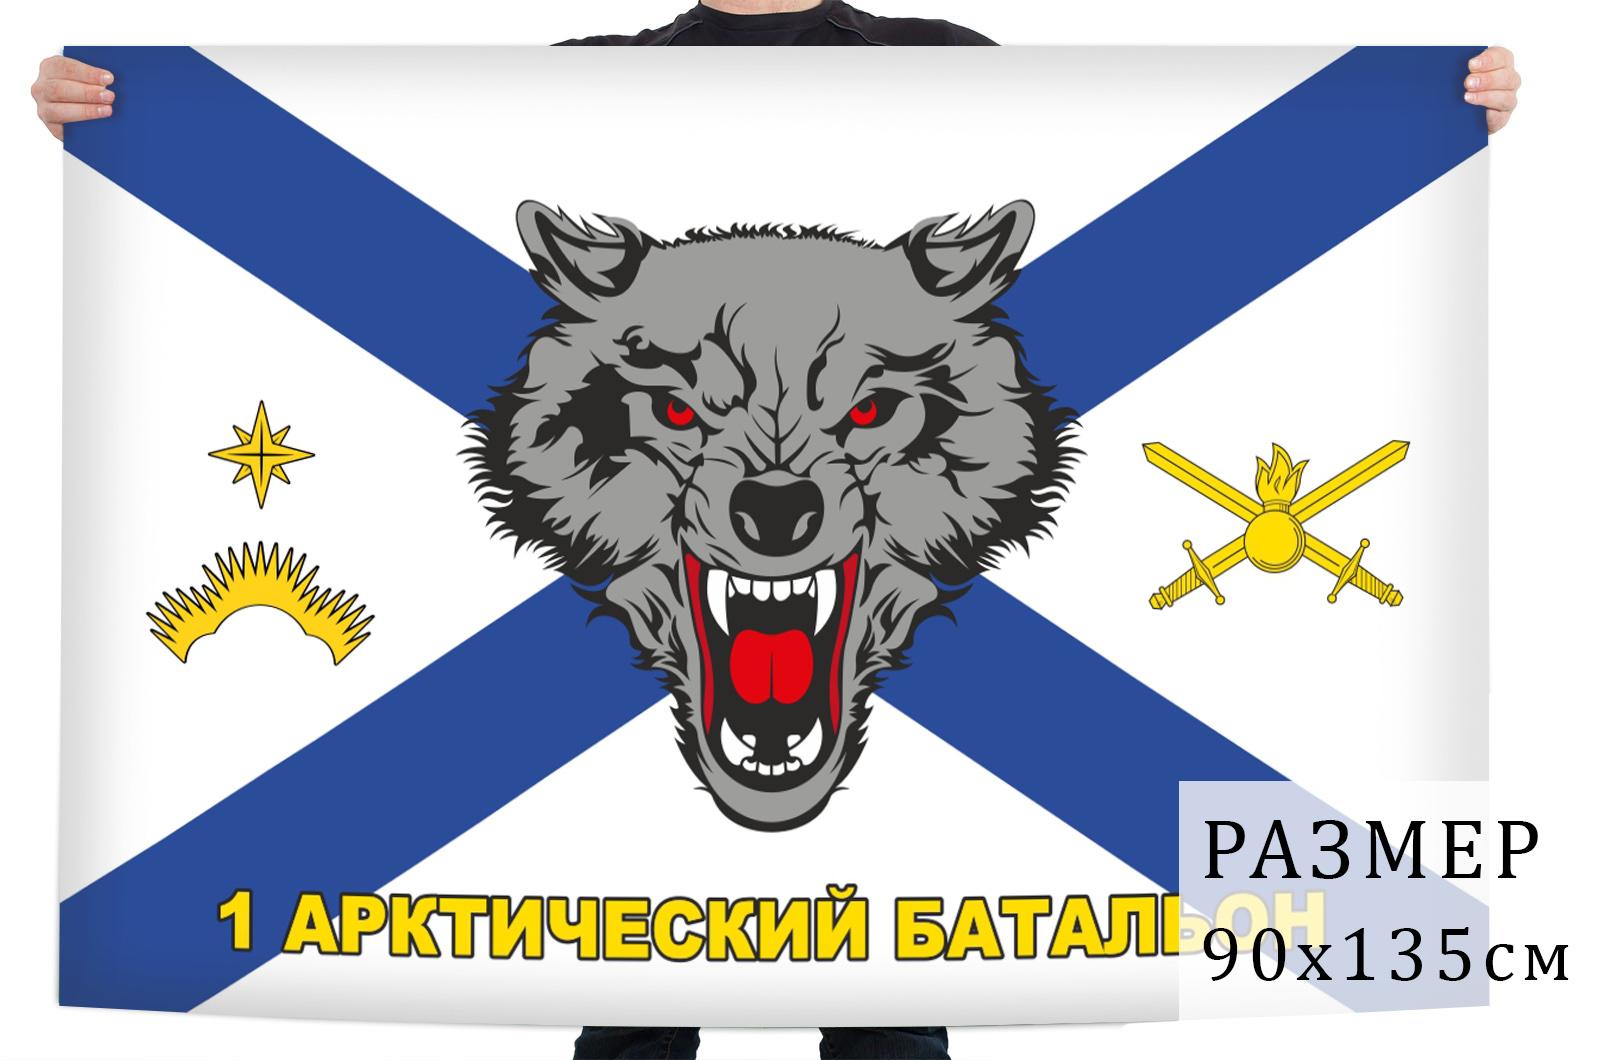 Флаг 1-го Арктического МСБ